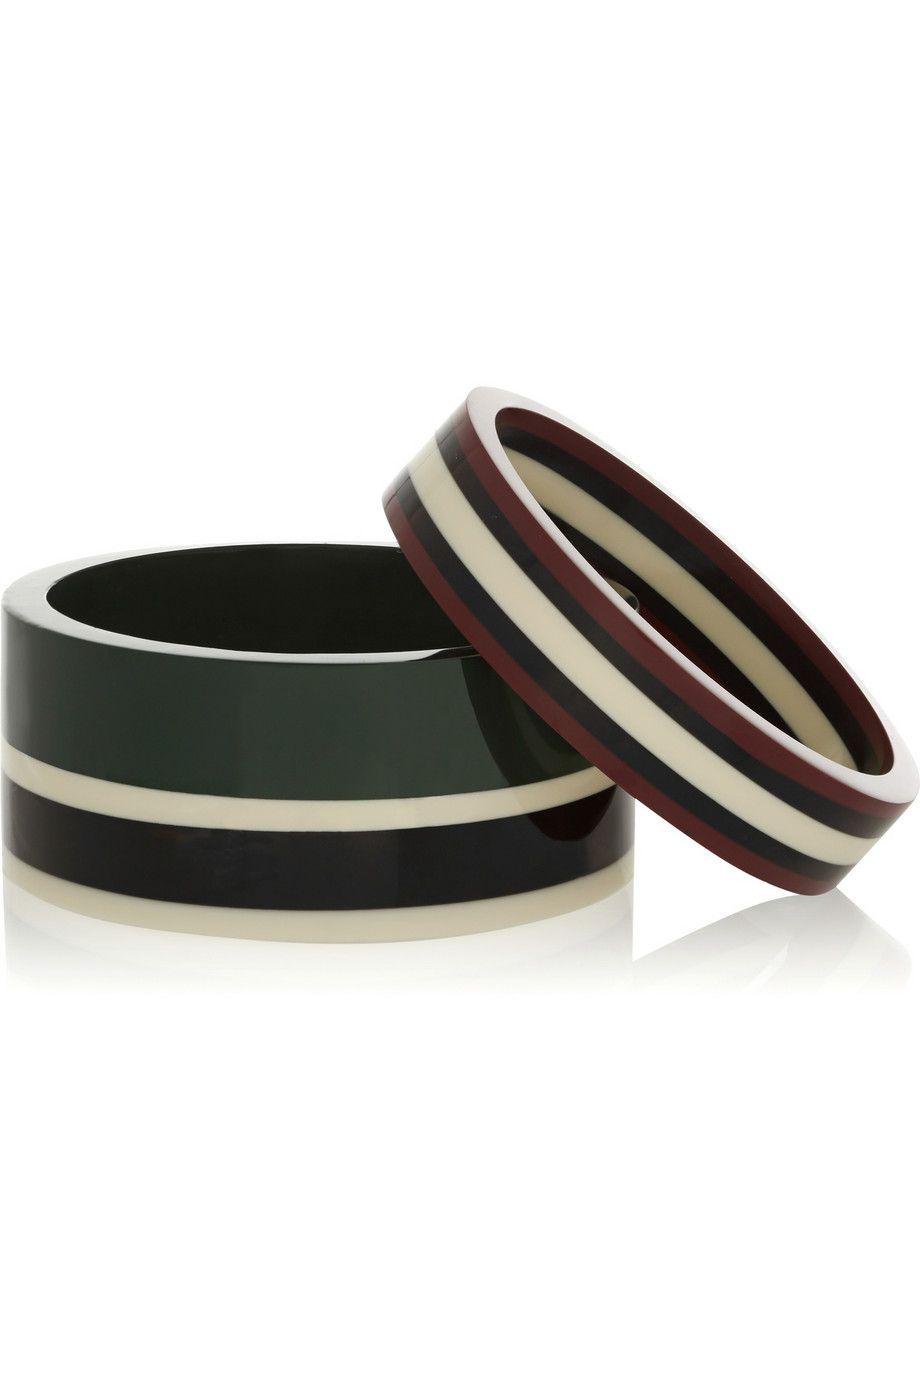 MARNI Set of two resin bracelets £300